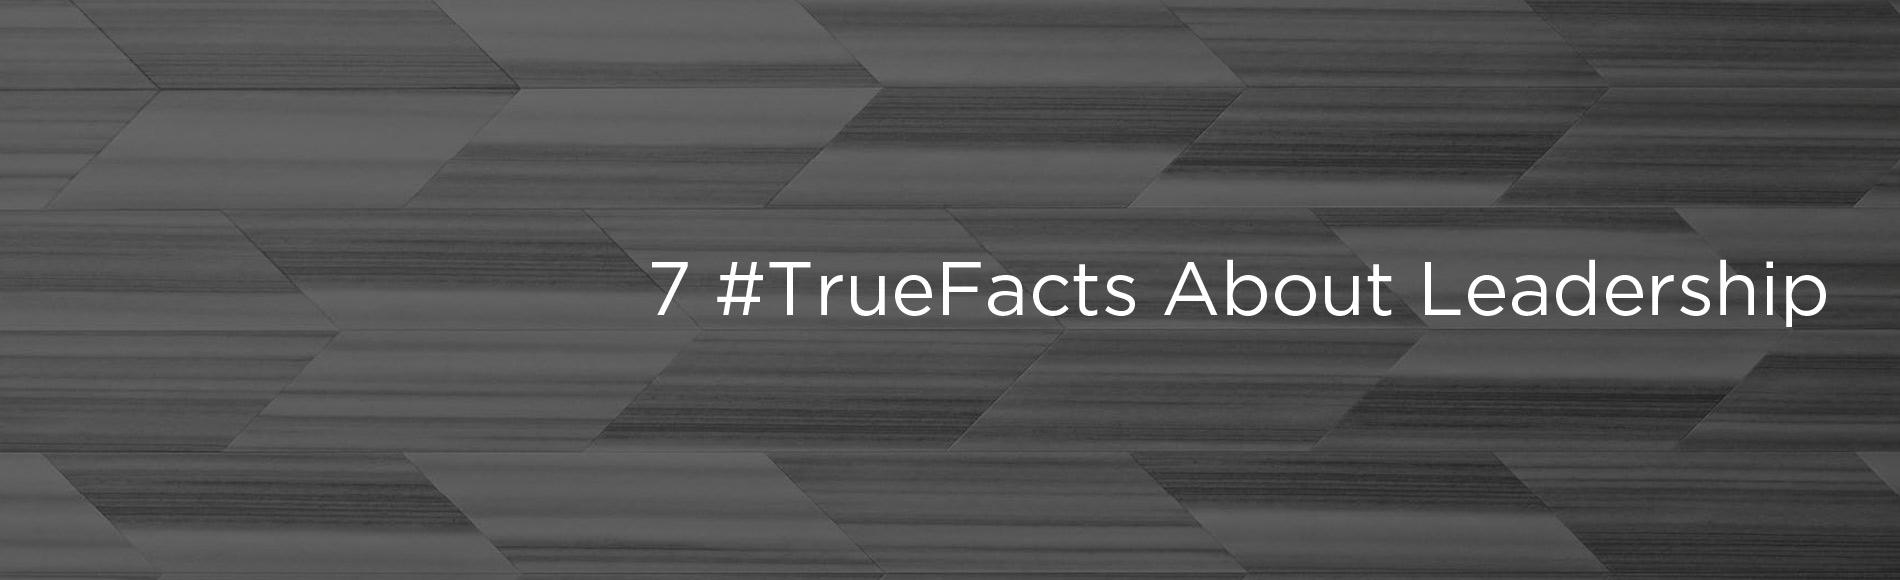 TrueFacts-Header